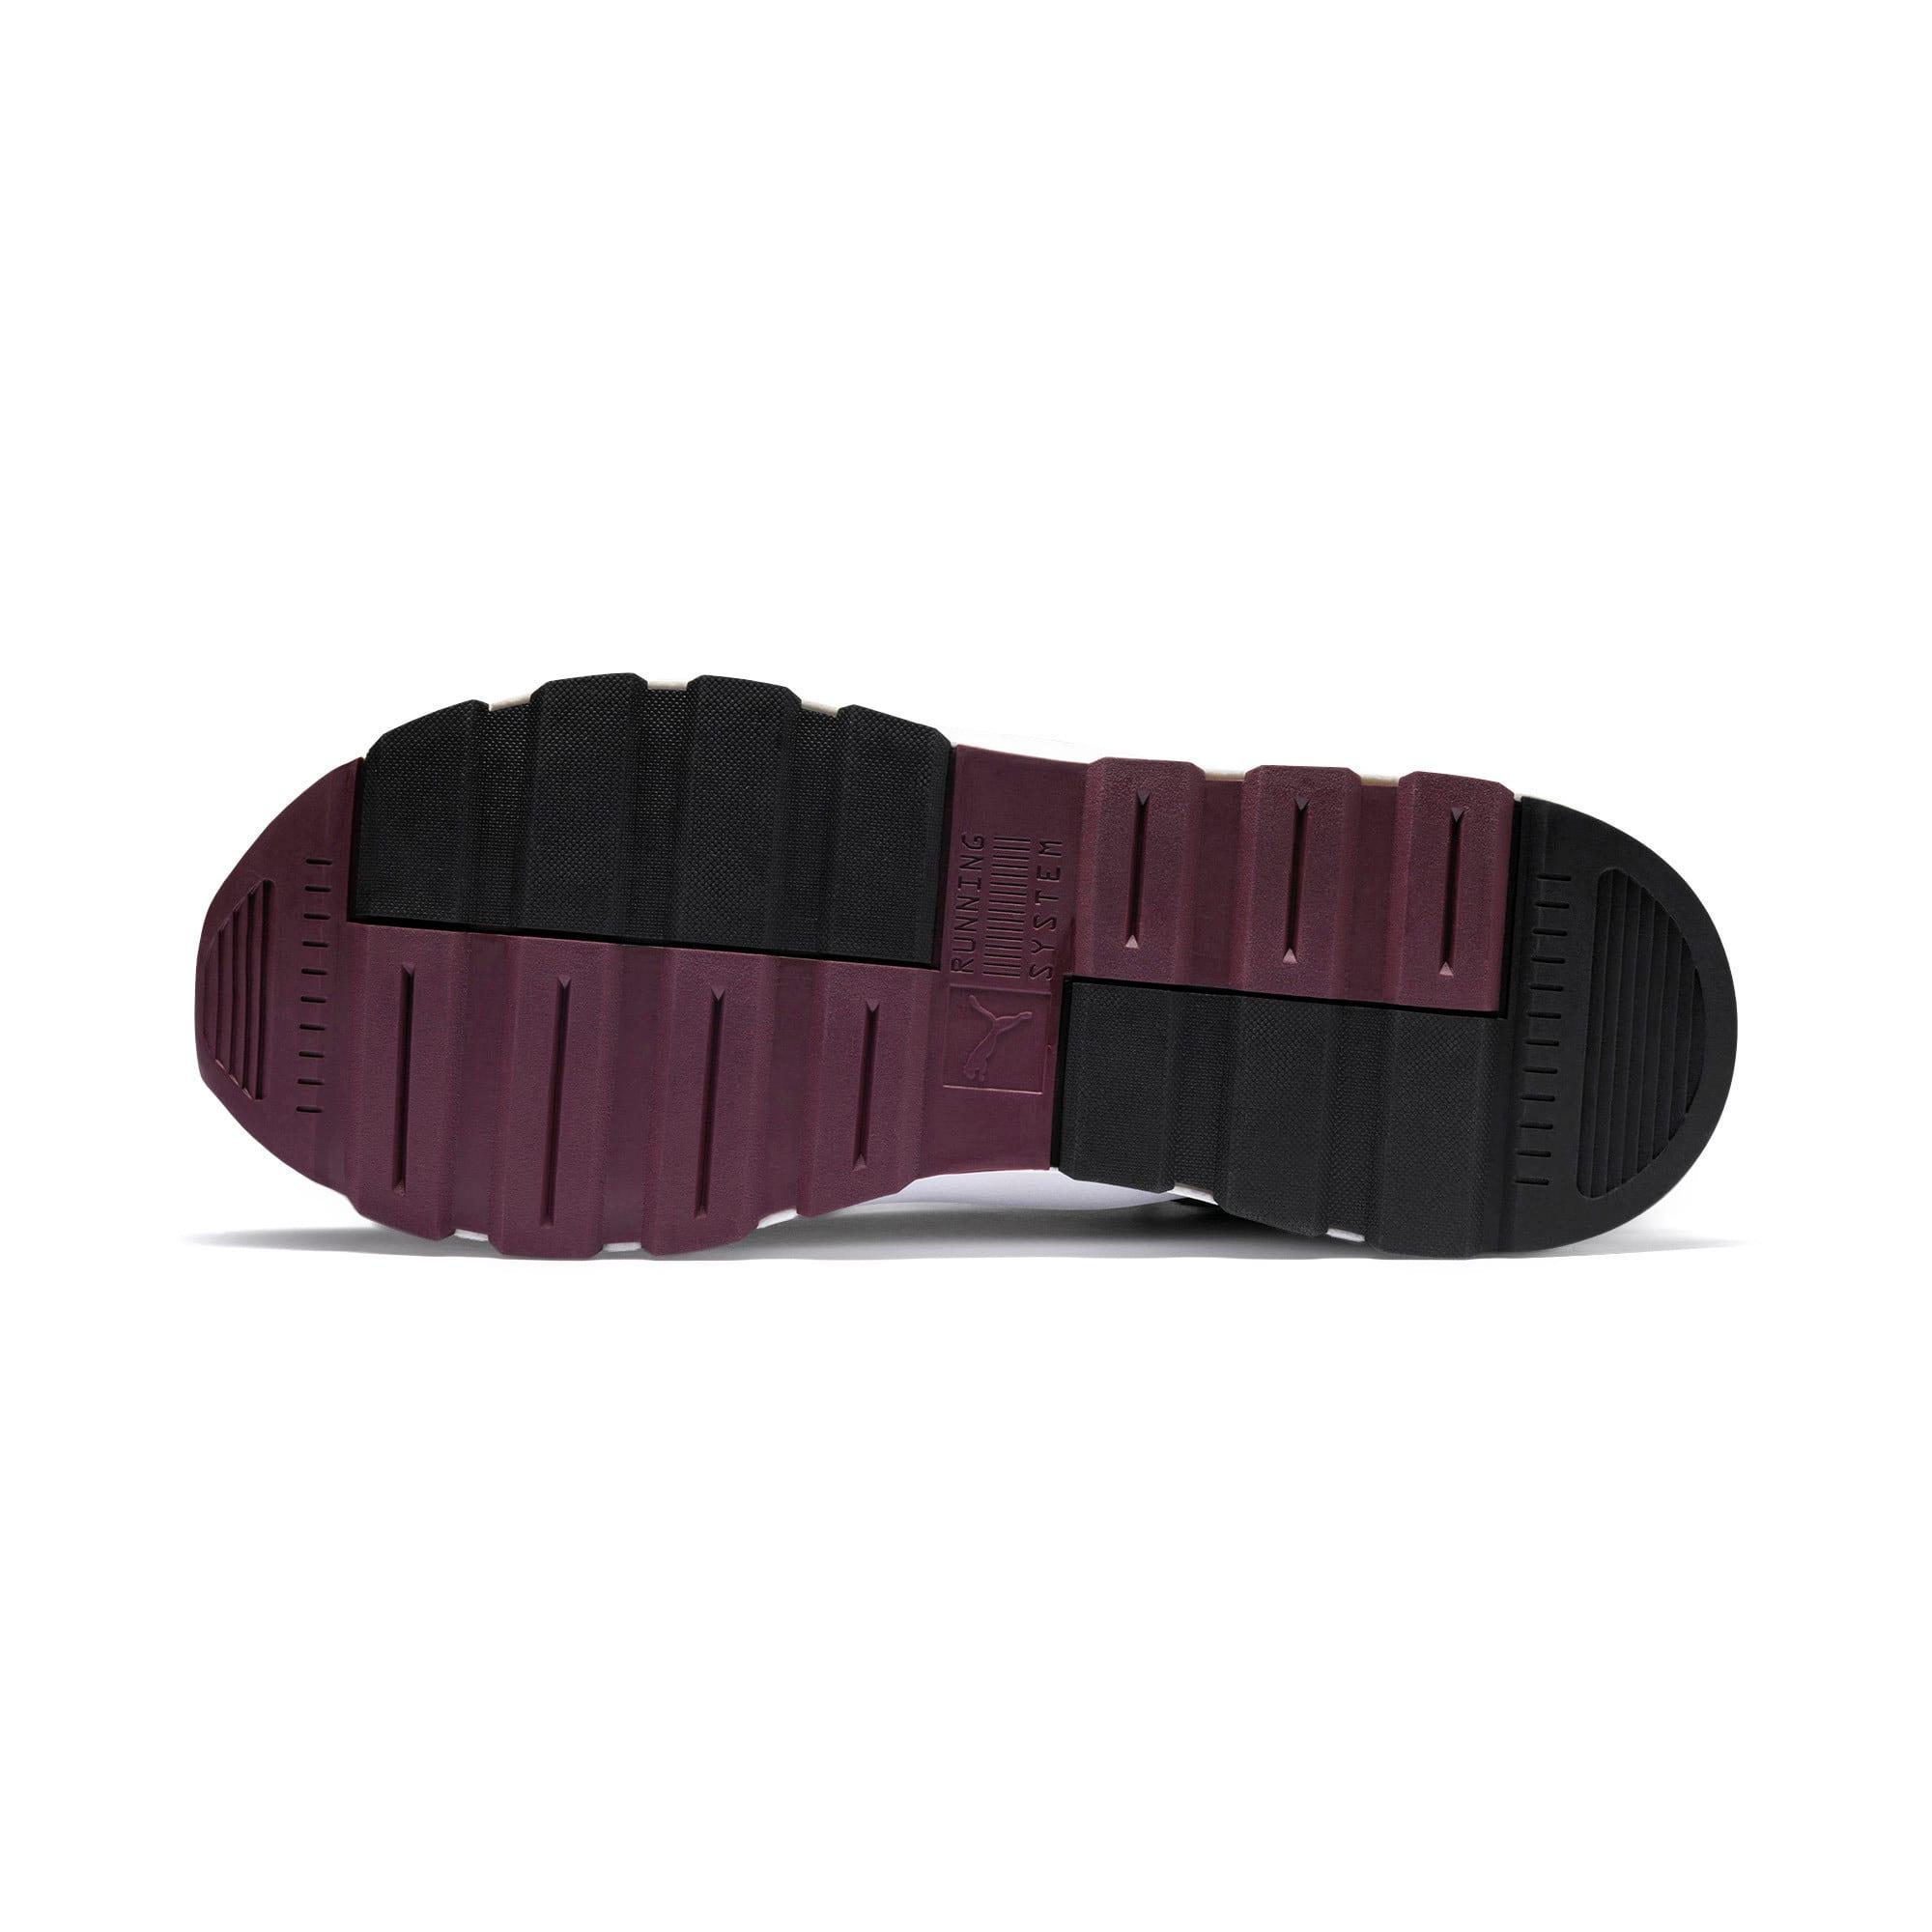 Thumbnail 6 of RS-0 LES BENJAMINS Sneakers, Puma White-Puma Black, medium